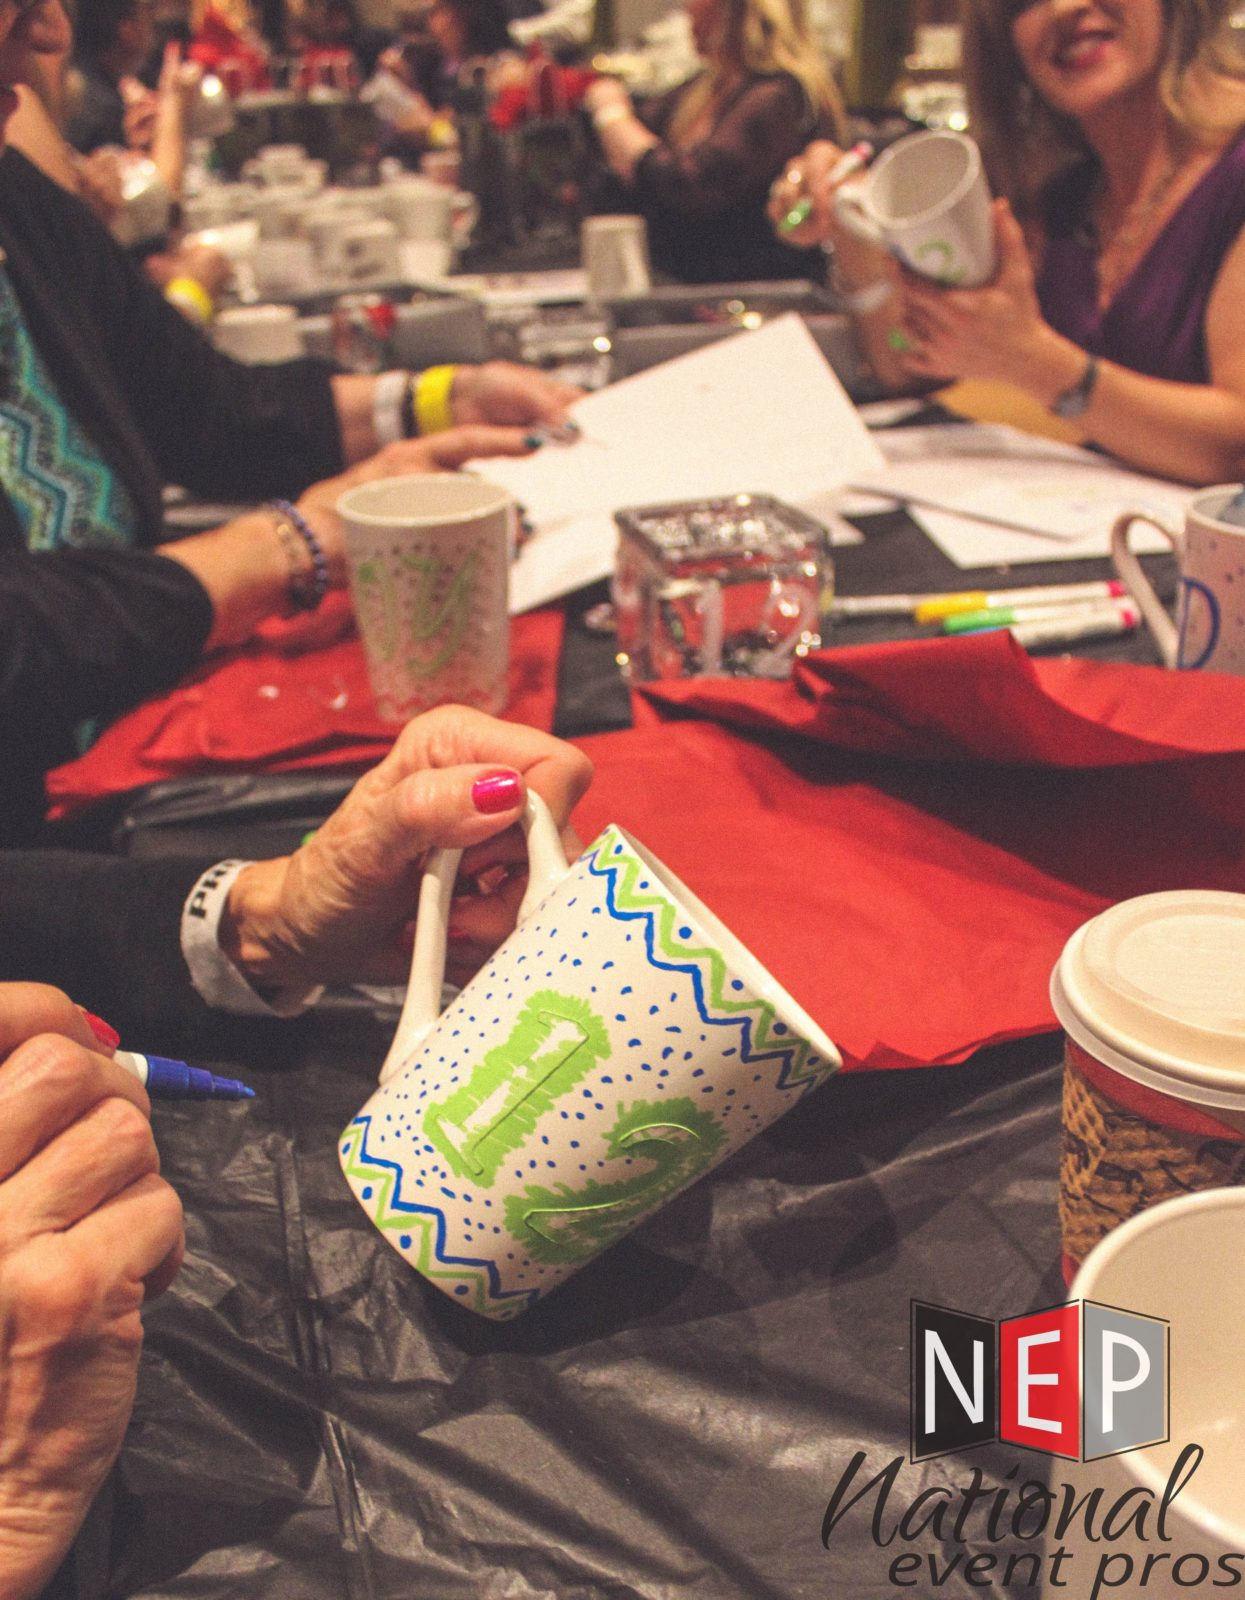 Custom Arts and Crafts Event Activity